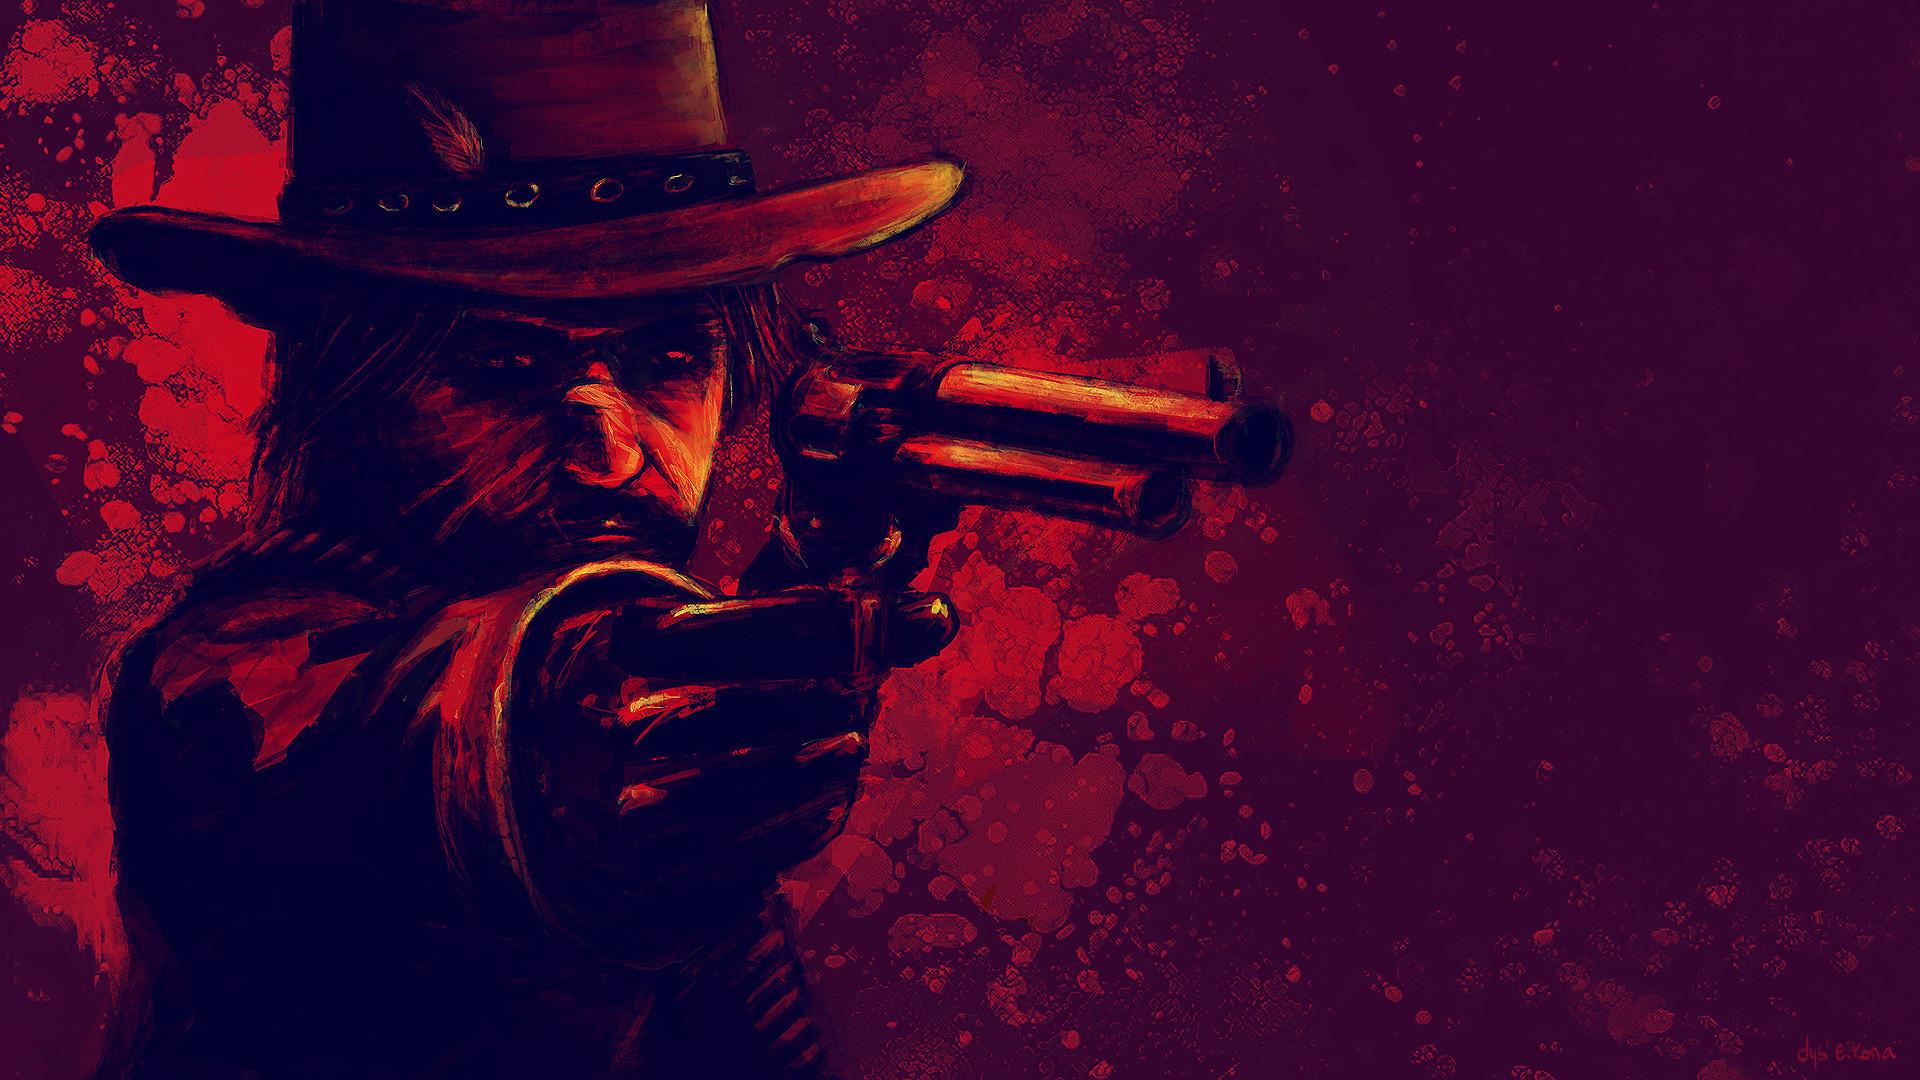 Red Dead Redemption 2 John Marston Wallpaper Hd Games 4k